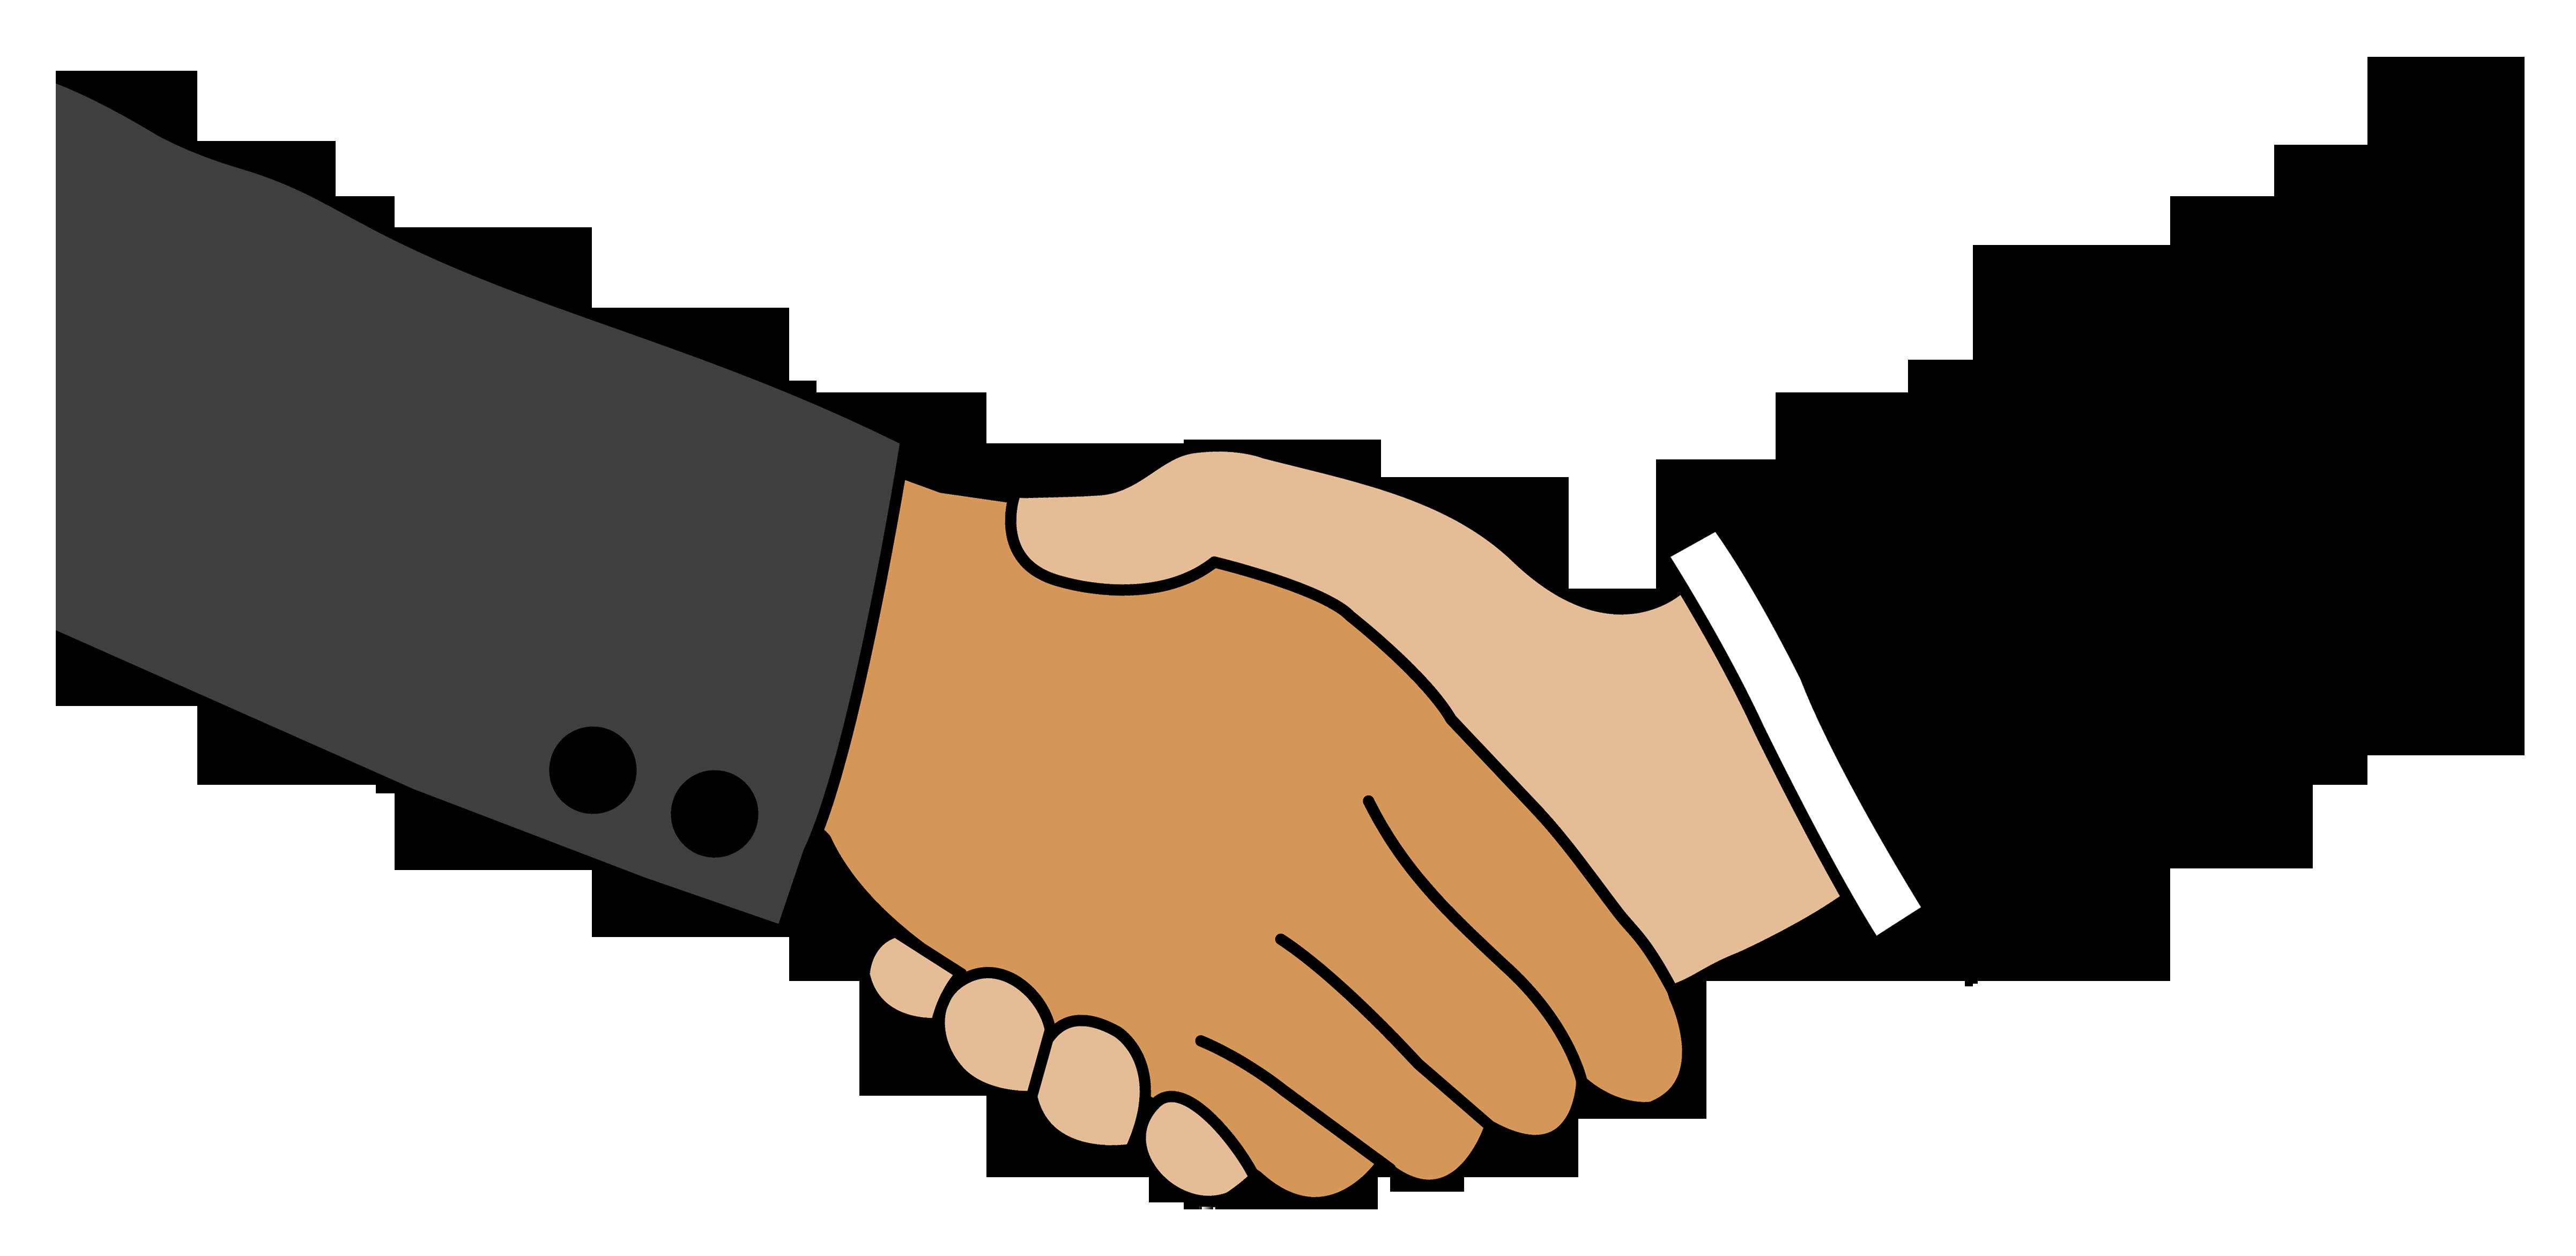 4805x2343 Business Handshake Free Clip Art